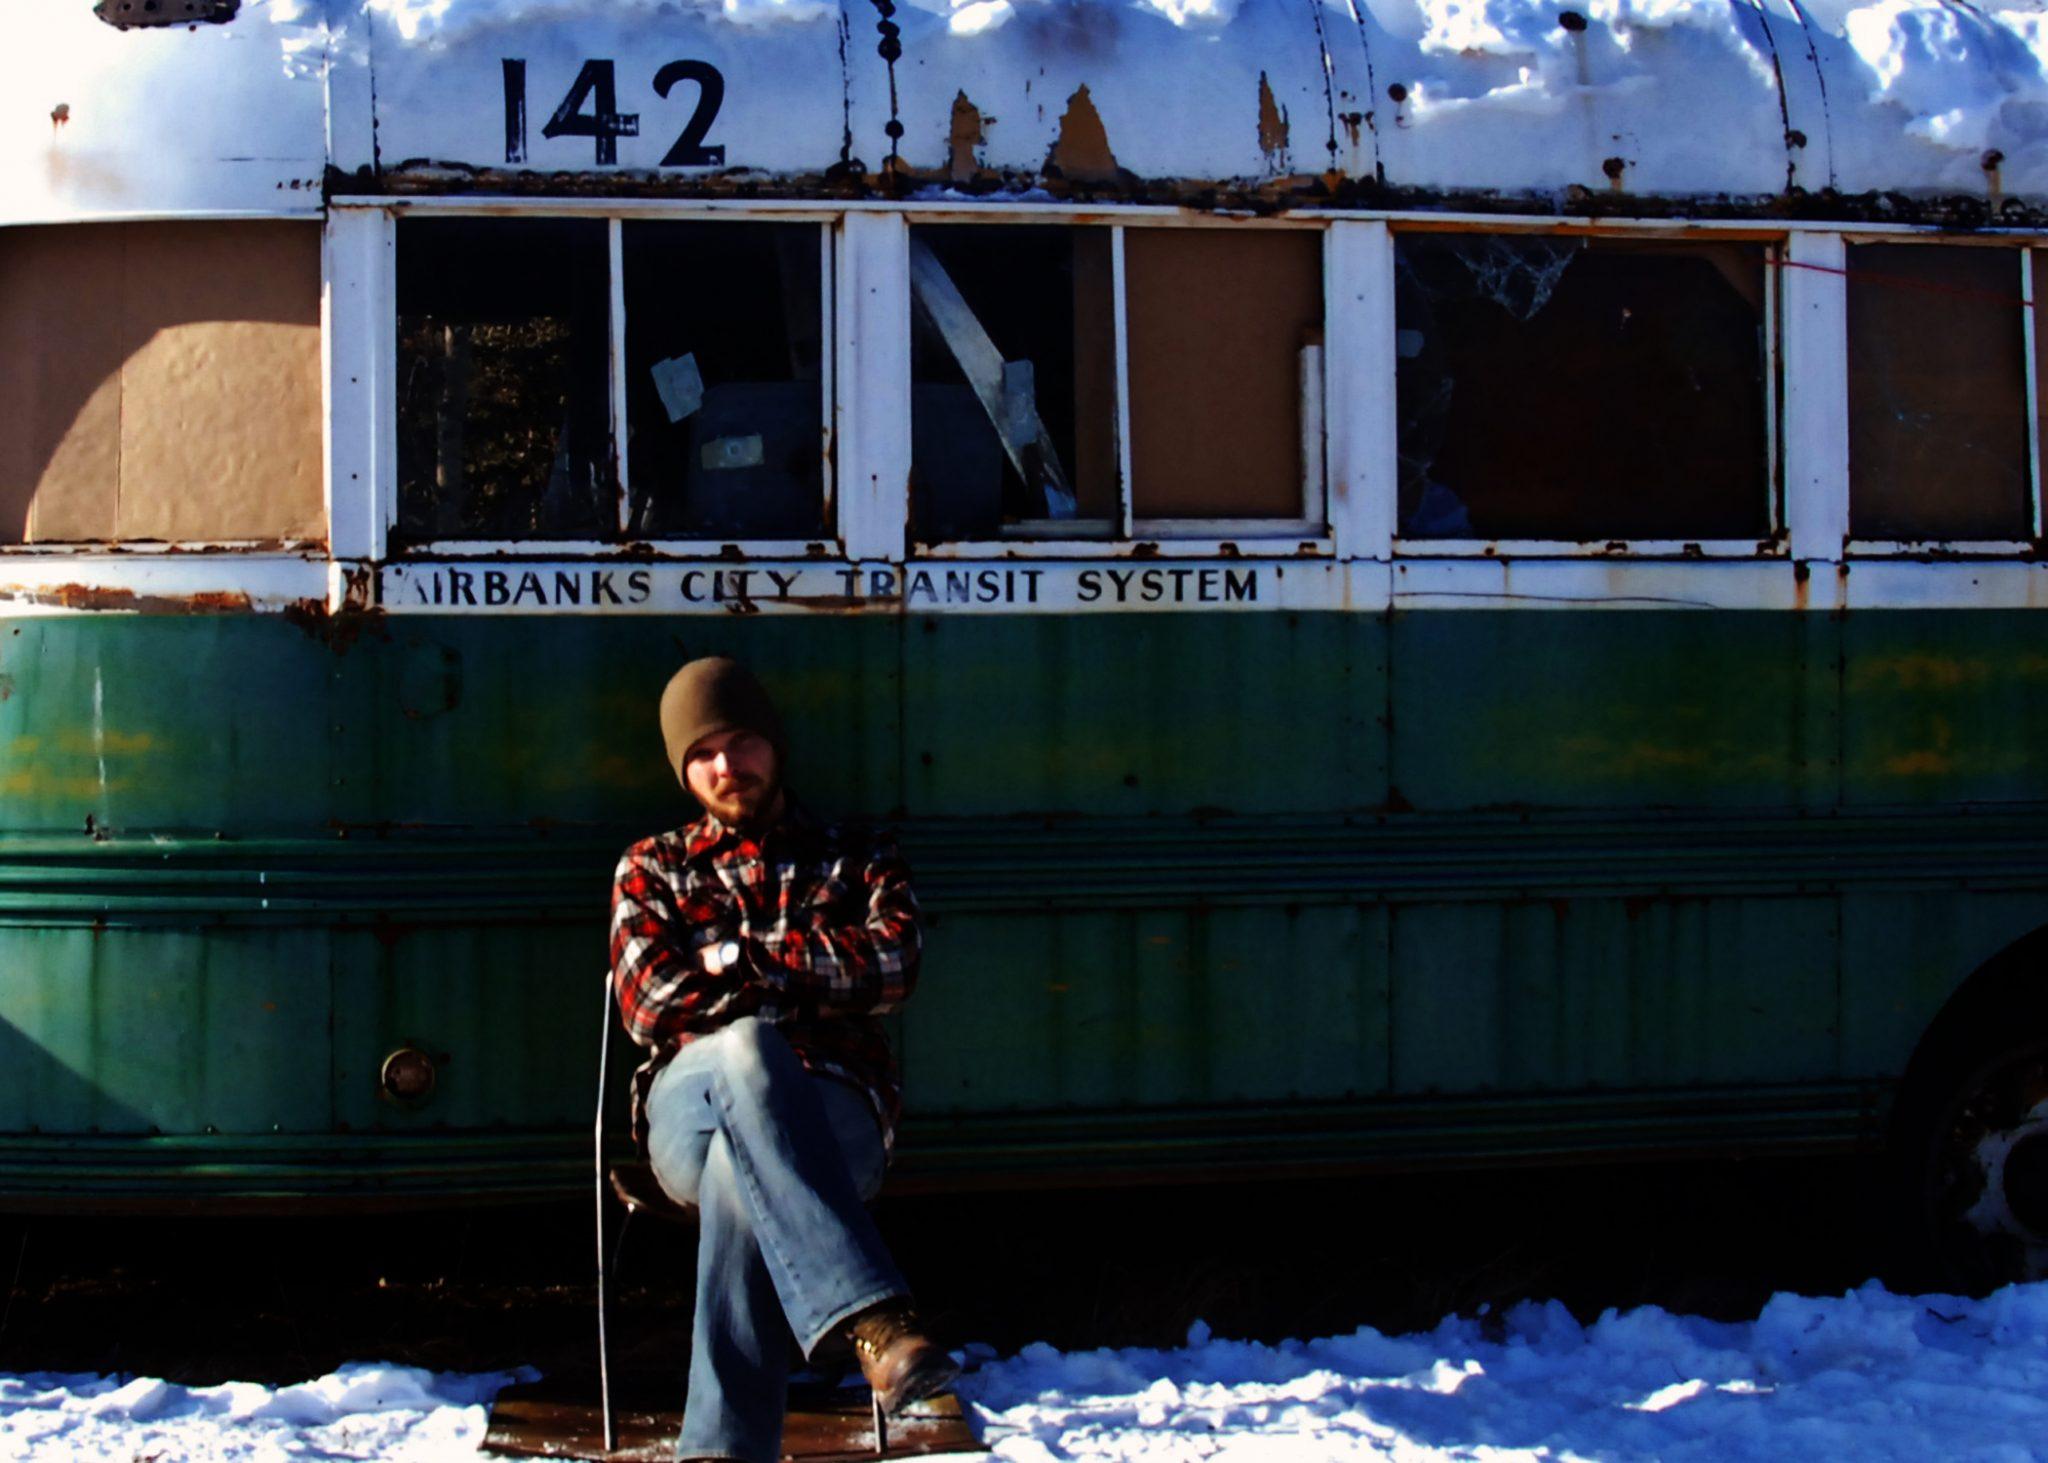 Finding Into the Wild's Magic Bus | freewheelings.com